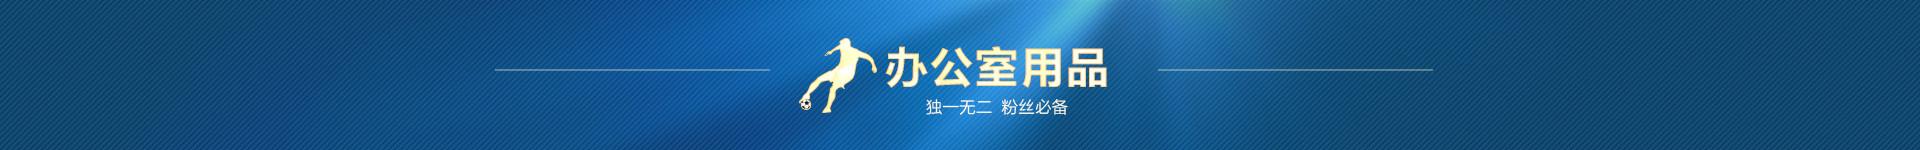 http://image.suning.cn/uimg/sop/commodity/101132848635688778415050_x.jpg